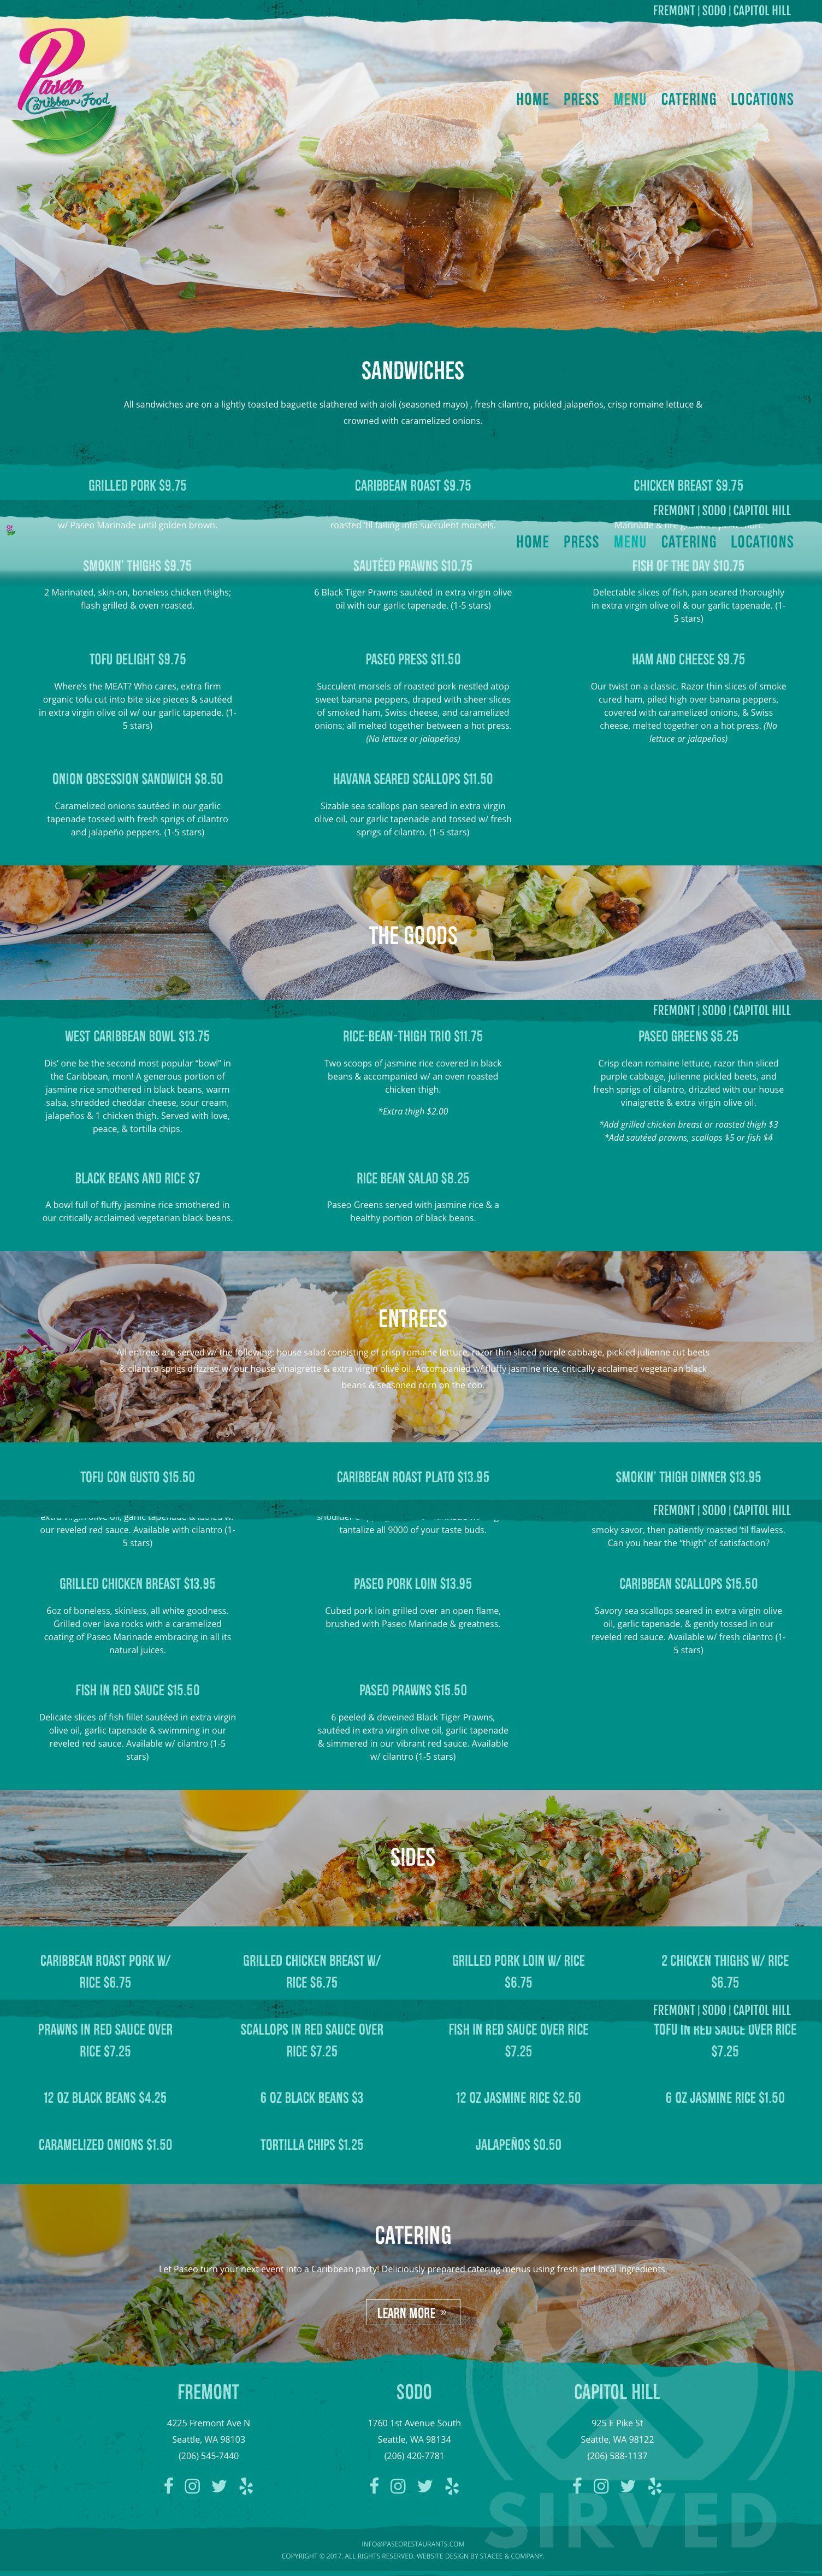 Menu For Paseo Caribbean Restaurant In Seattle Washington